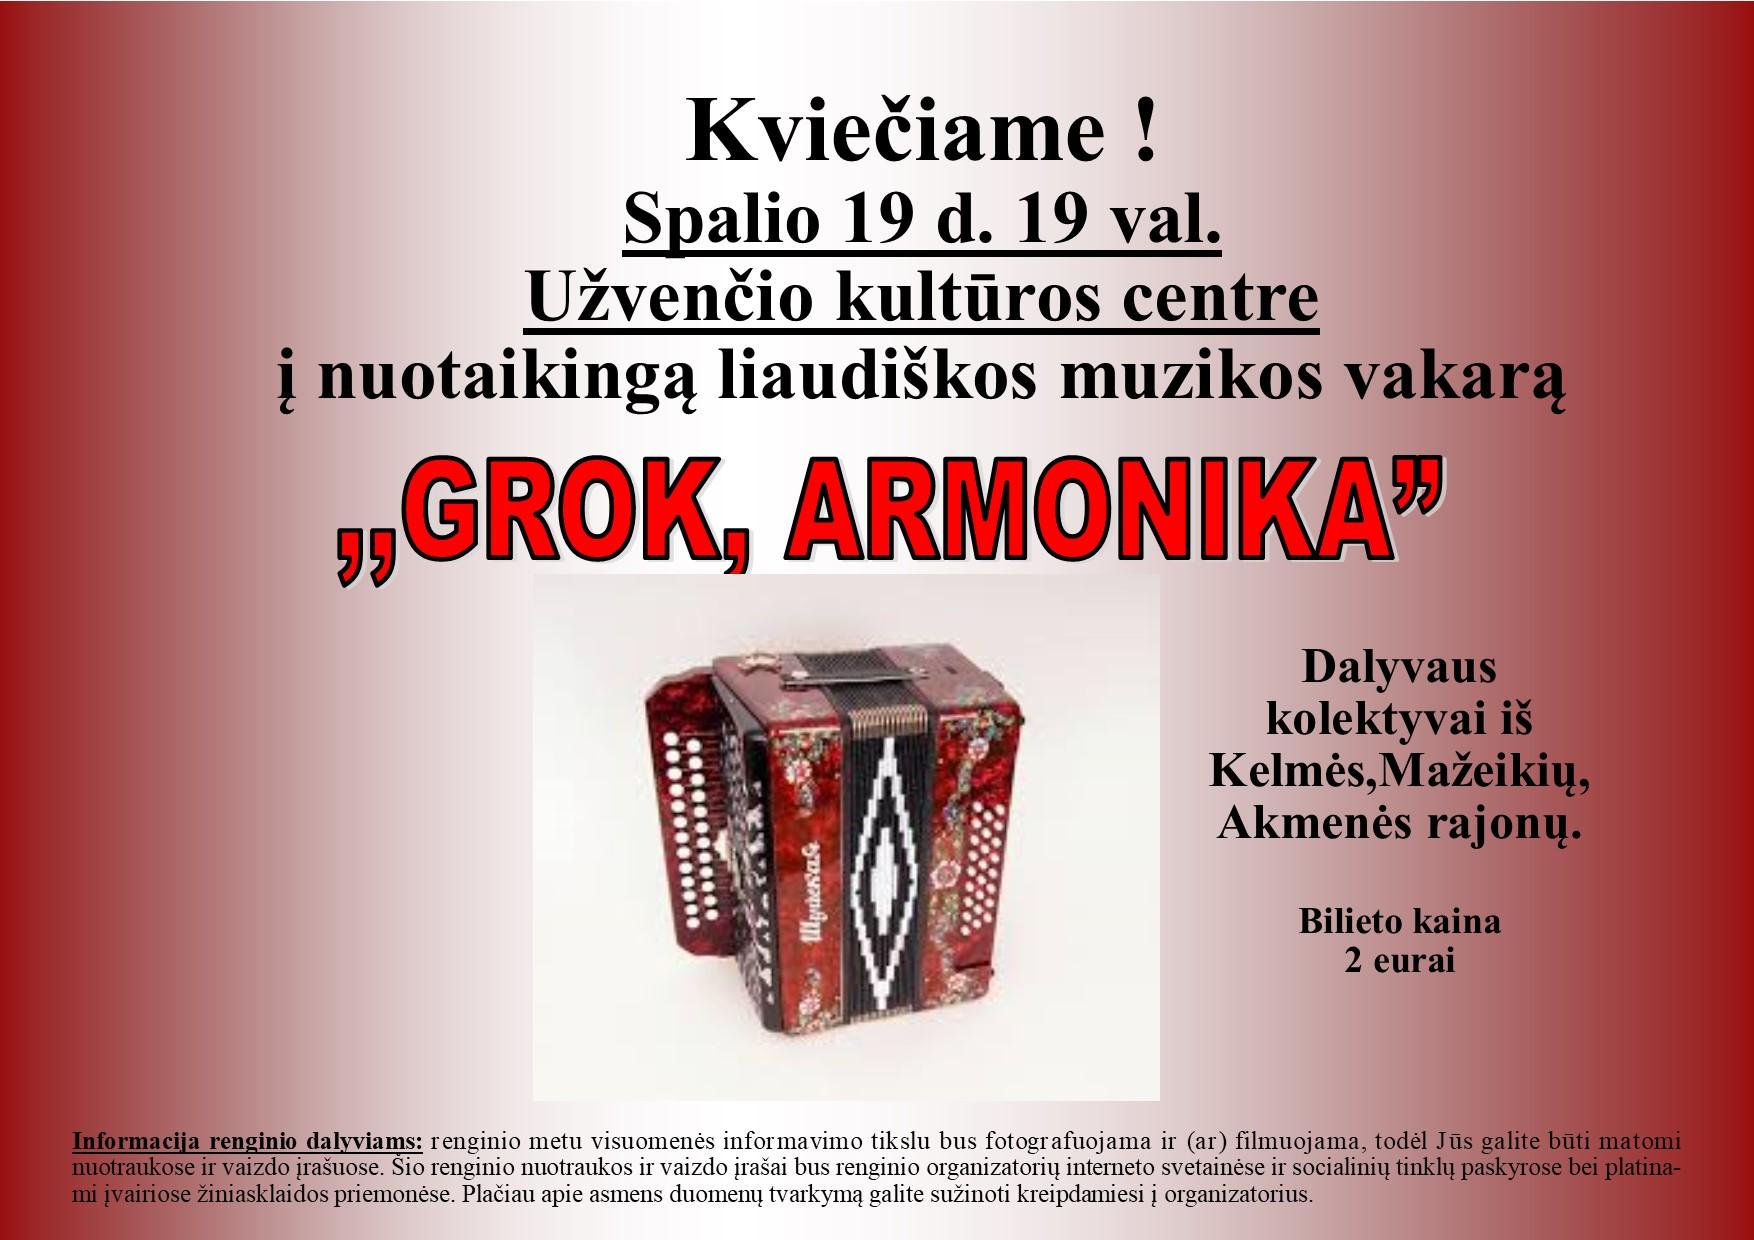 Grok, Armonika